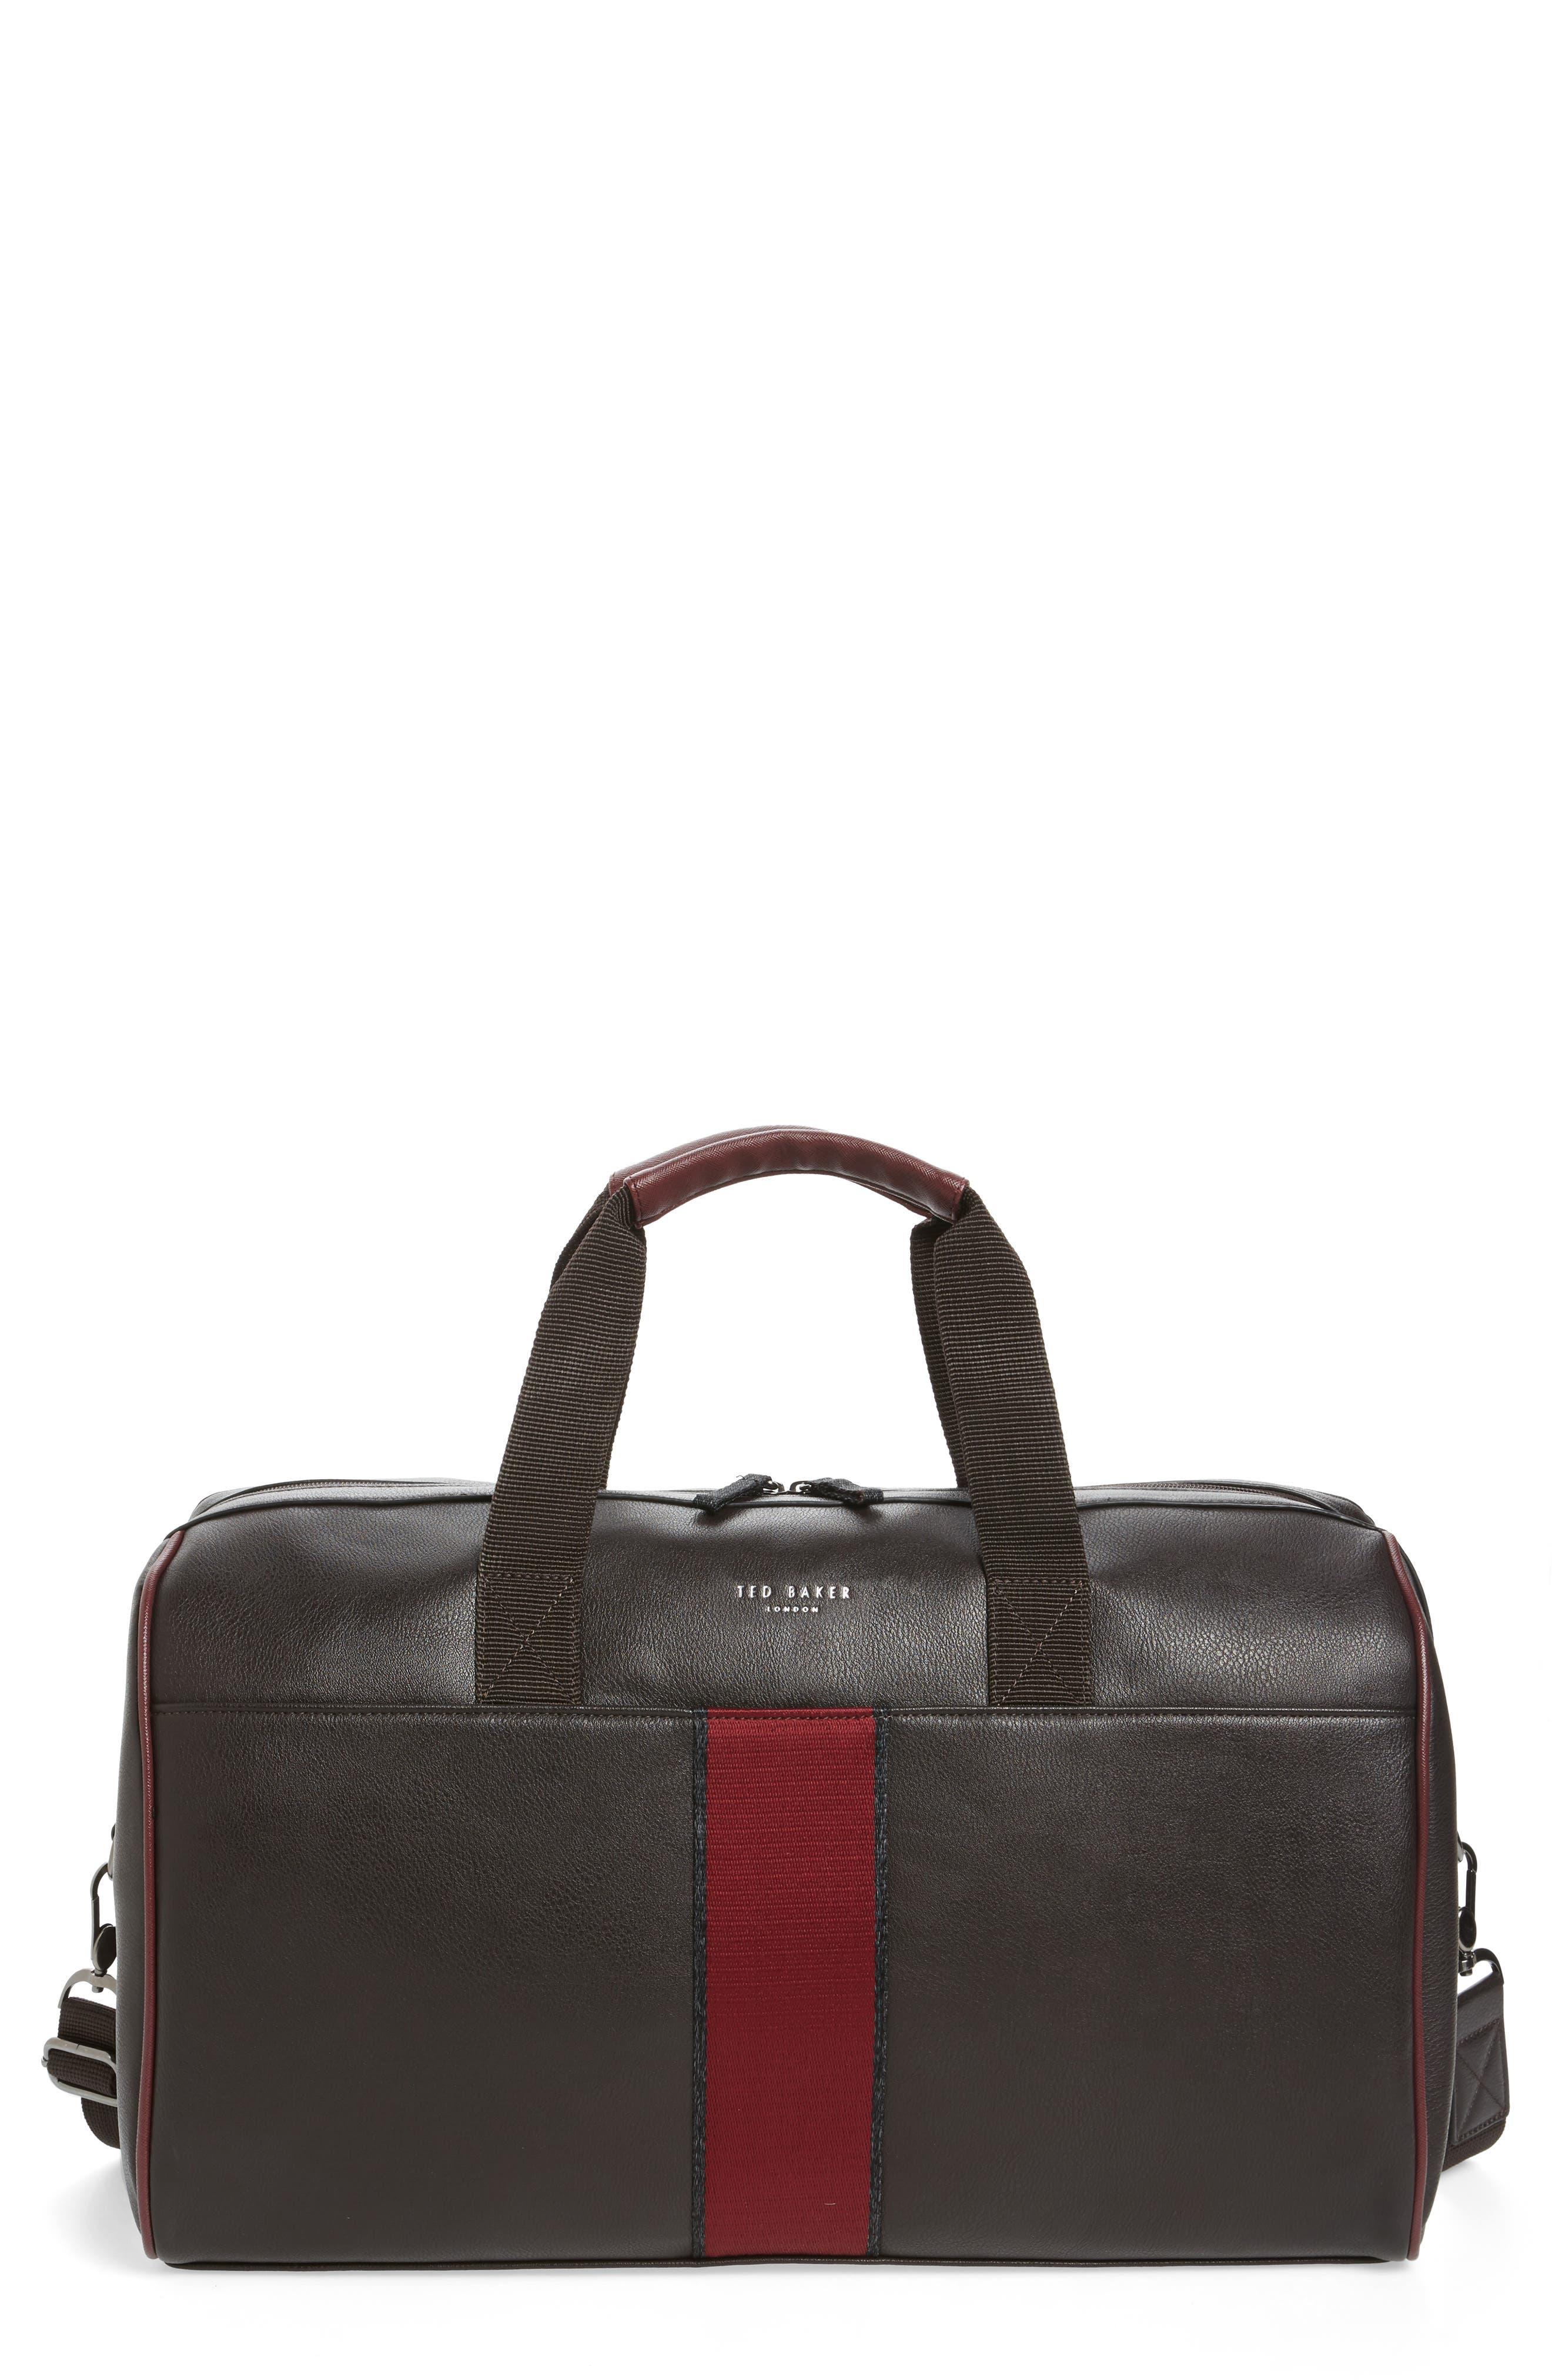 Main Image - Ted Baker London Kray Duffel Bag